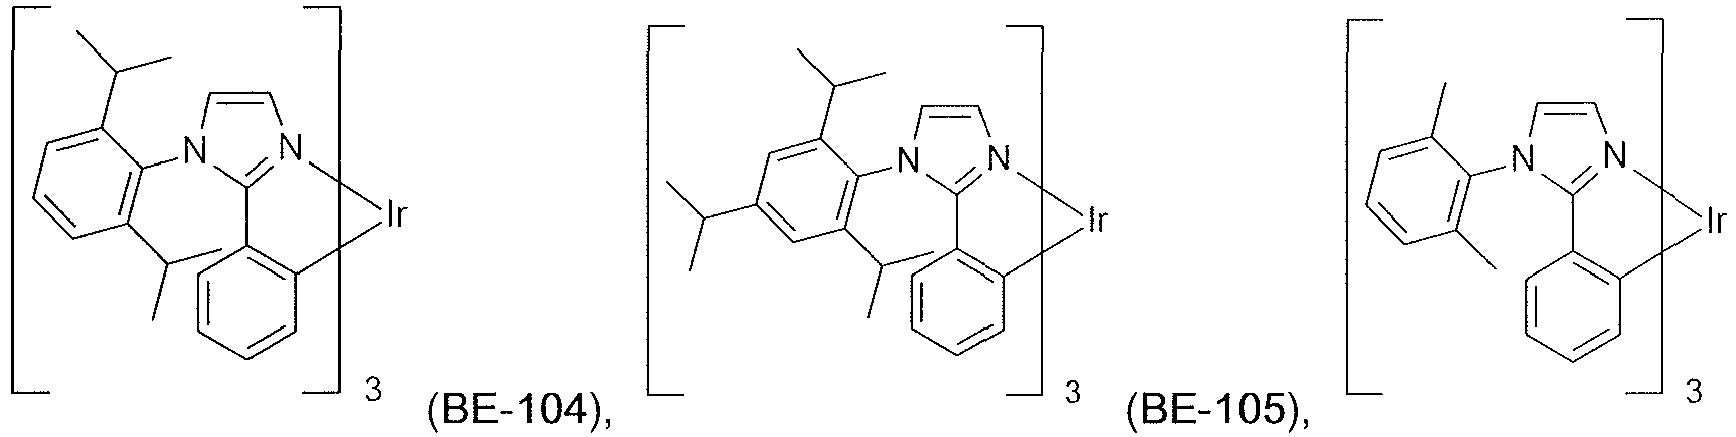 Figure imgb0640